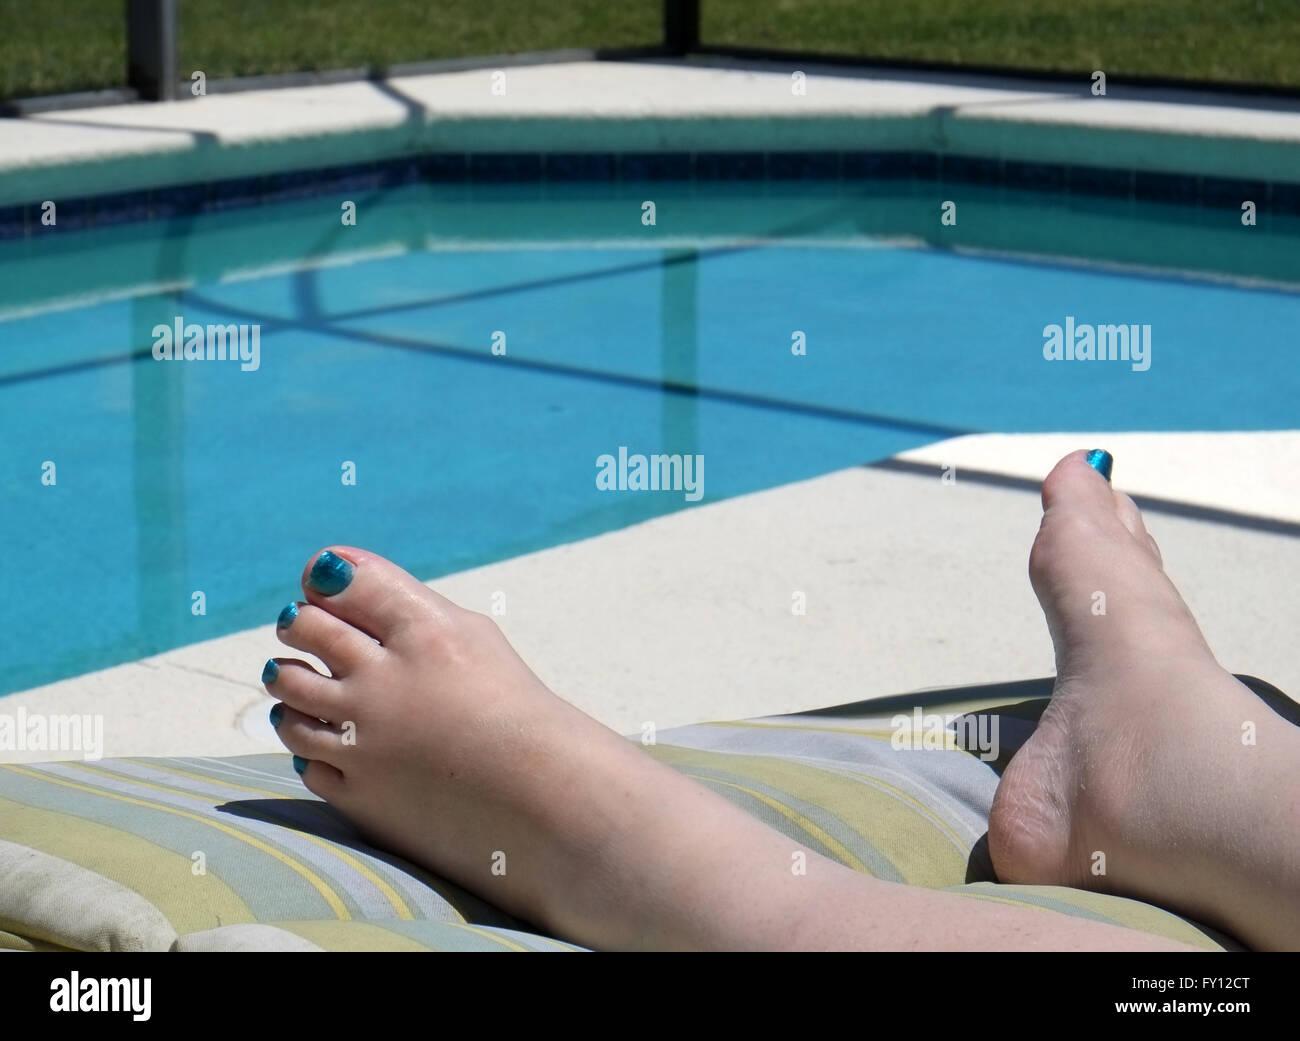 Reife Frauen Füße Bilder